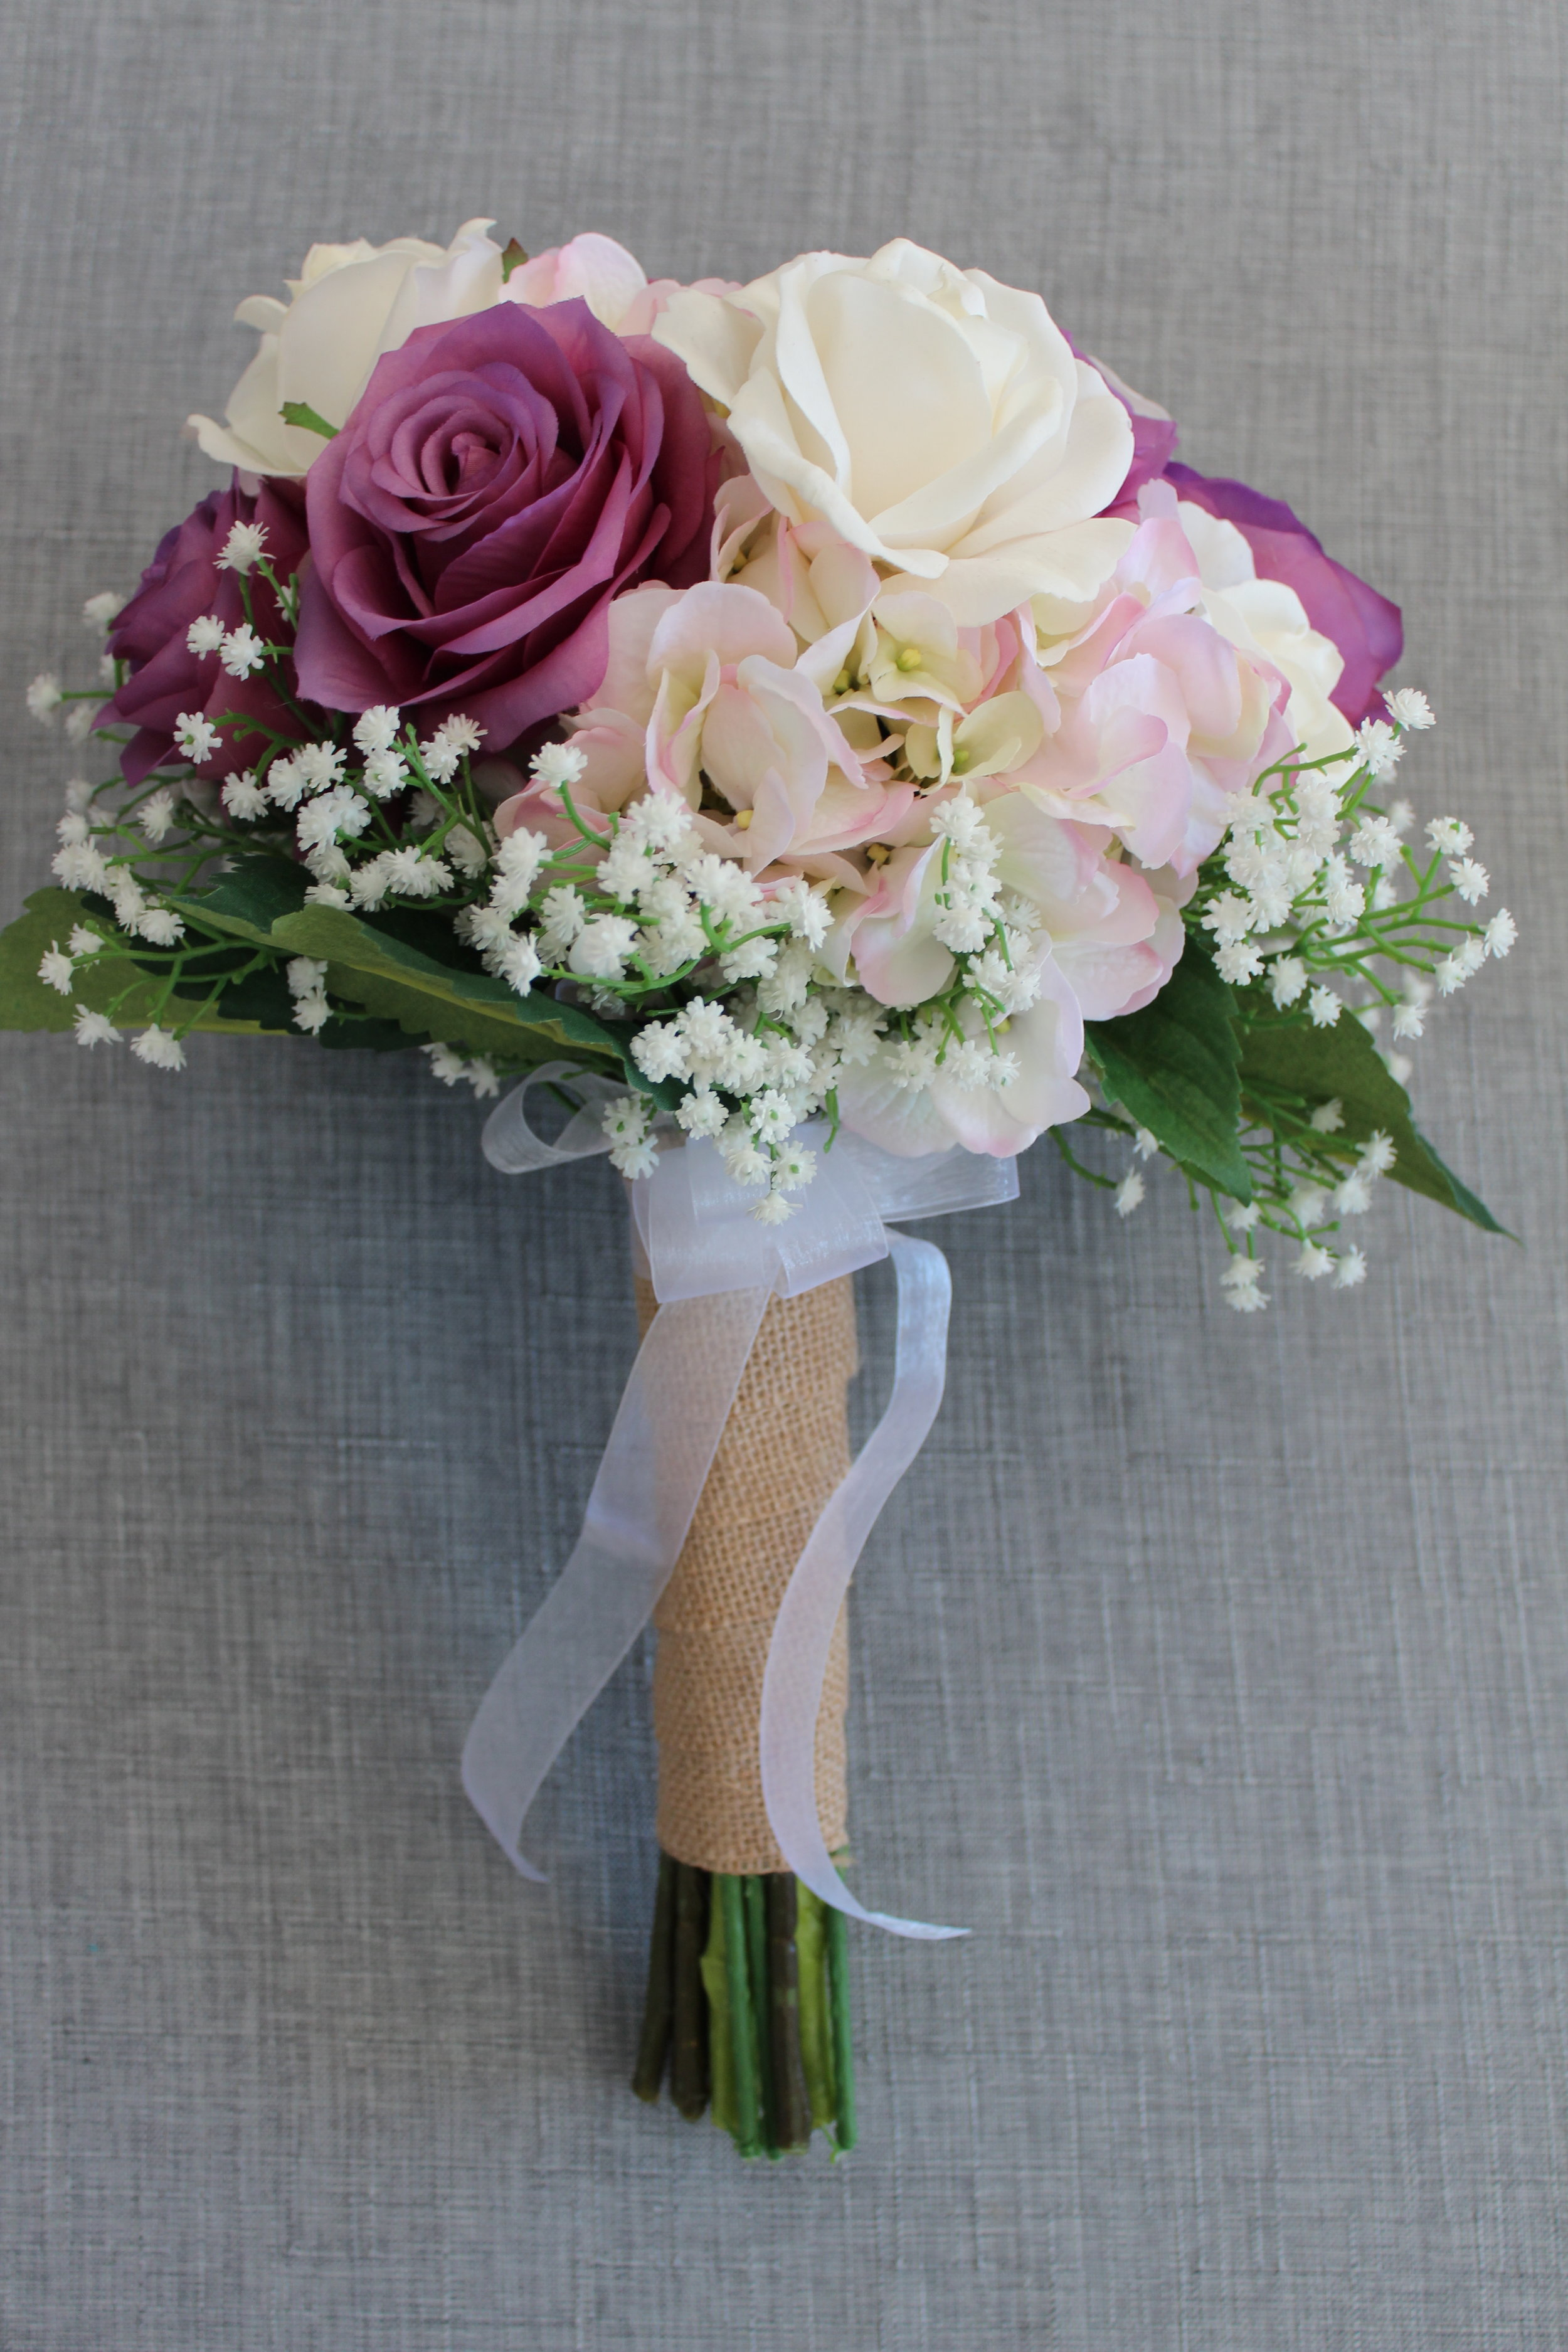 Cream Roses, Lavender Roses, Mauve Hydrangea, Baby's Breath, Hydrangea Leaves, Burlap and Ribbon.